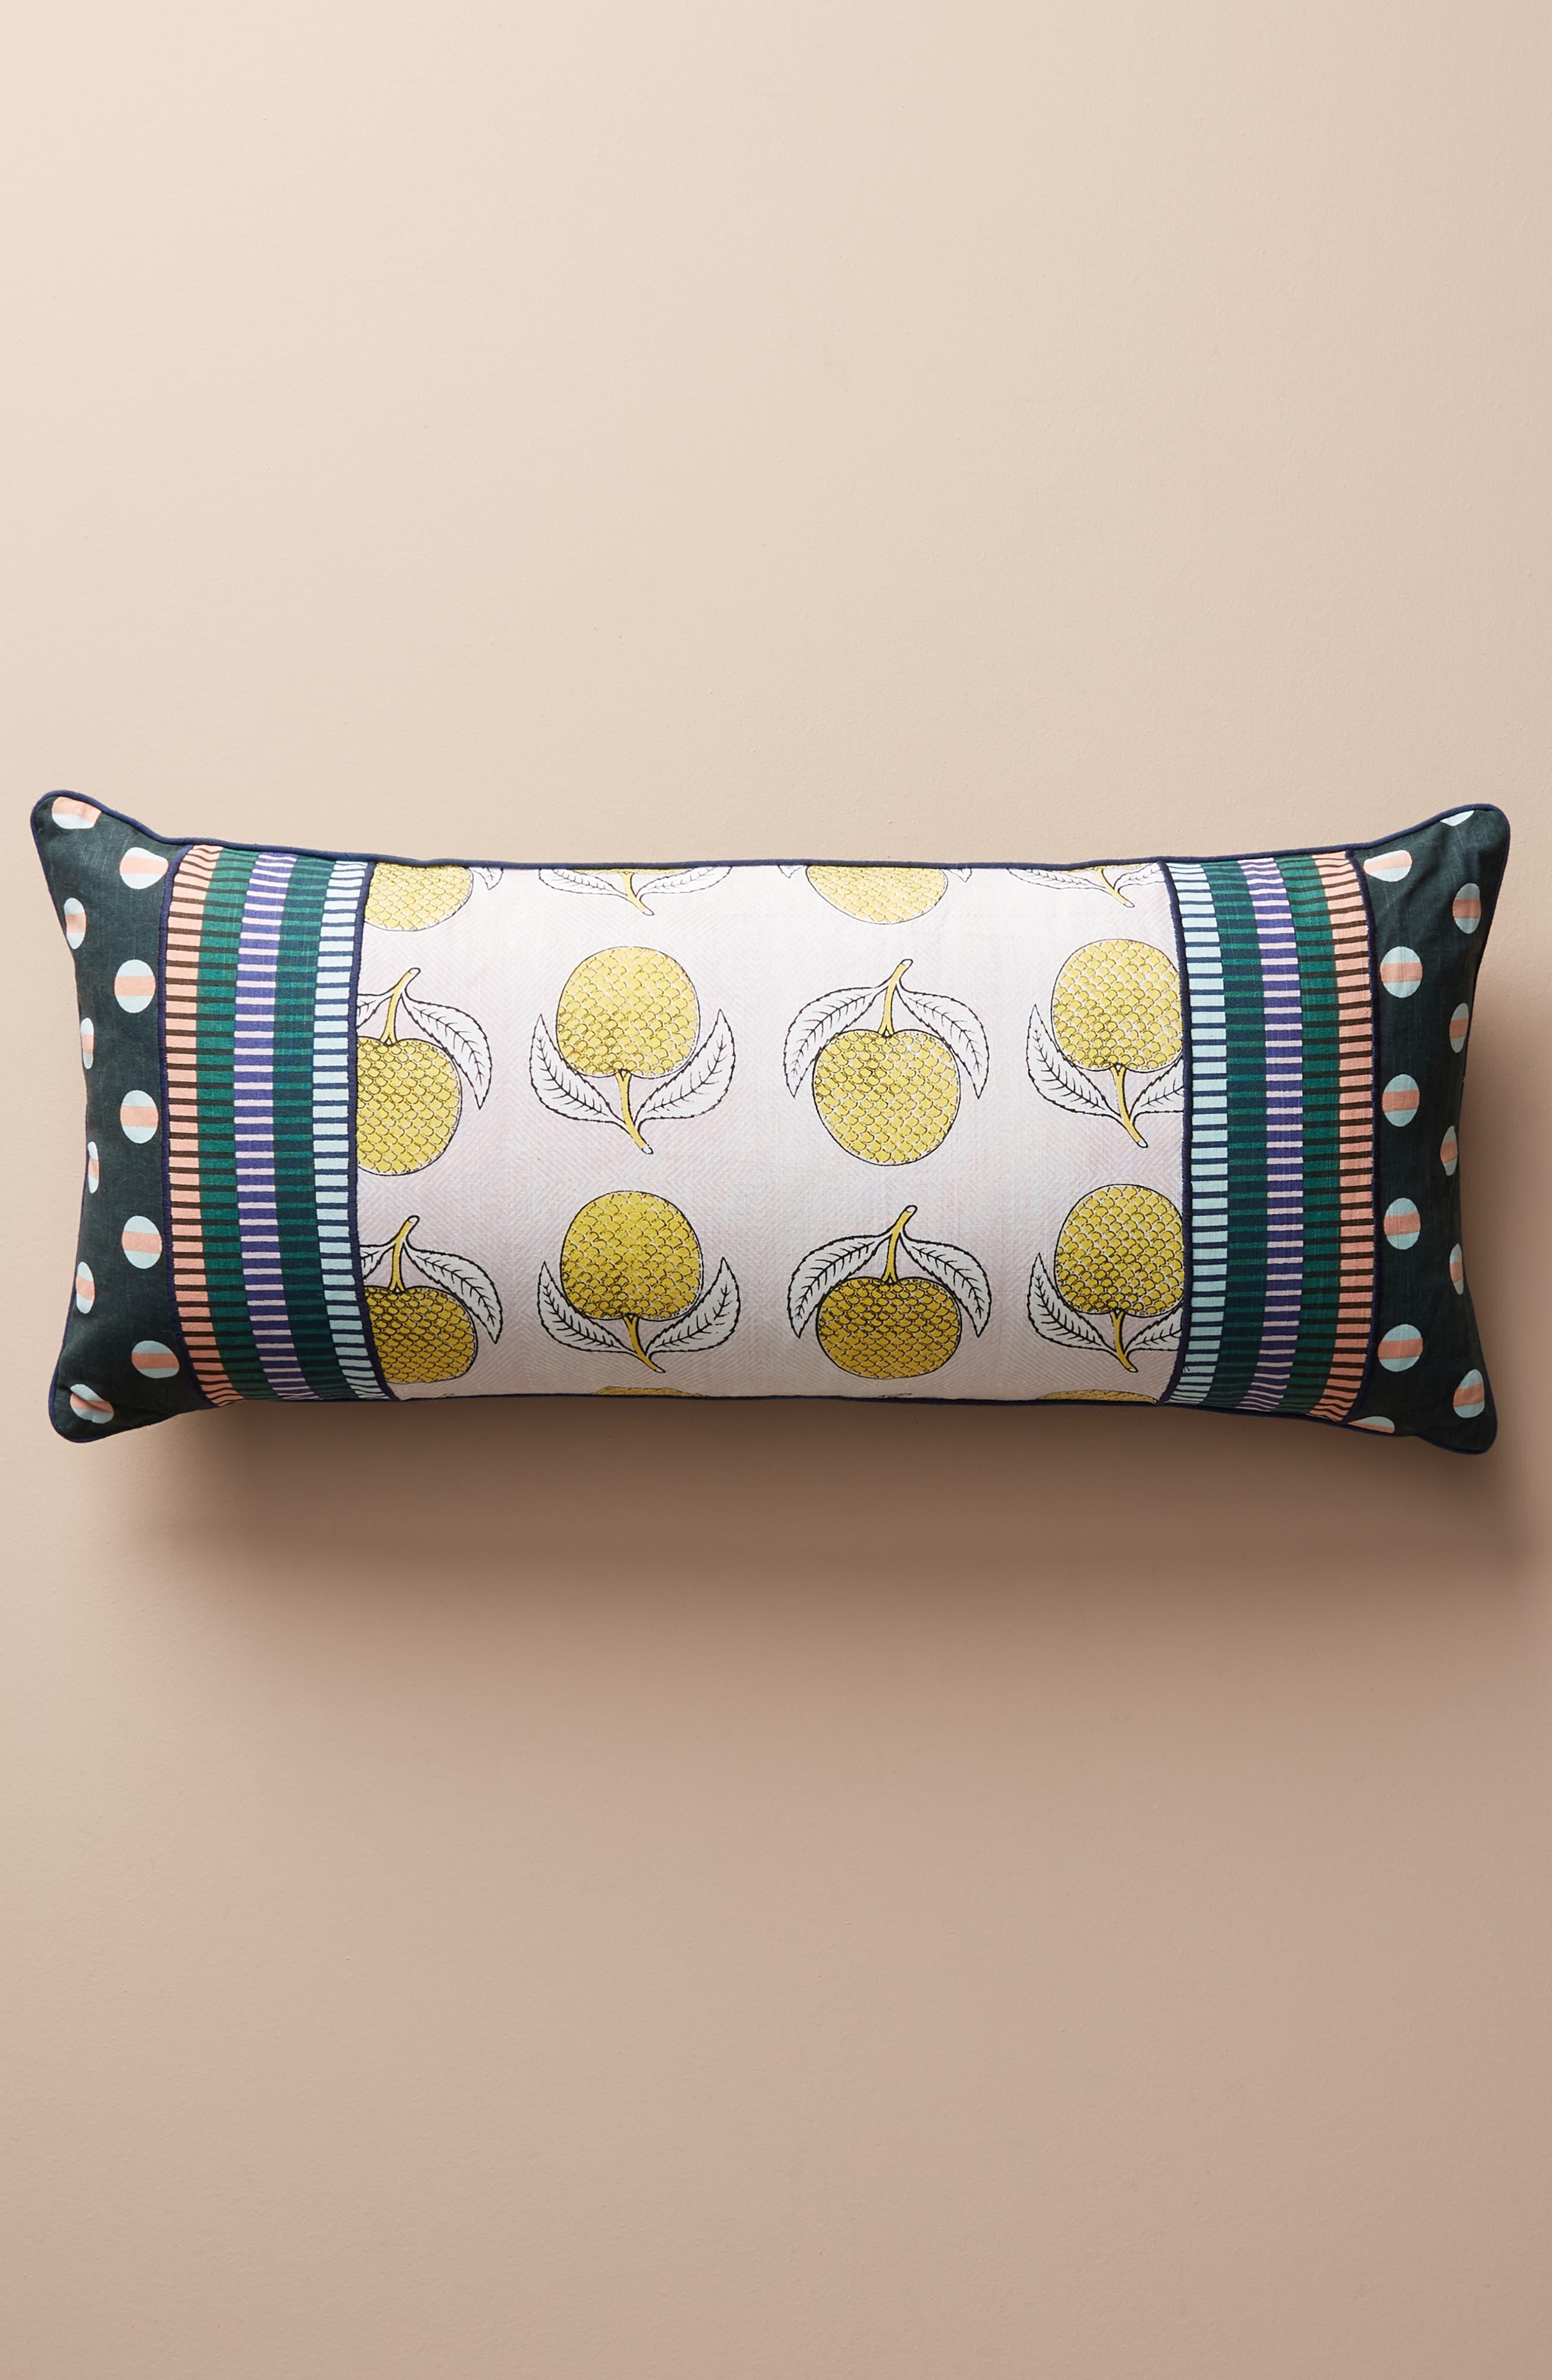 anthropologie x suno lumbar accent pillow